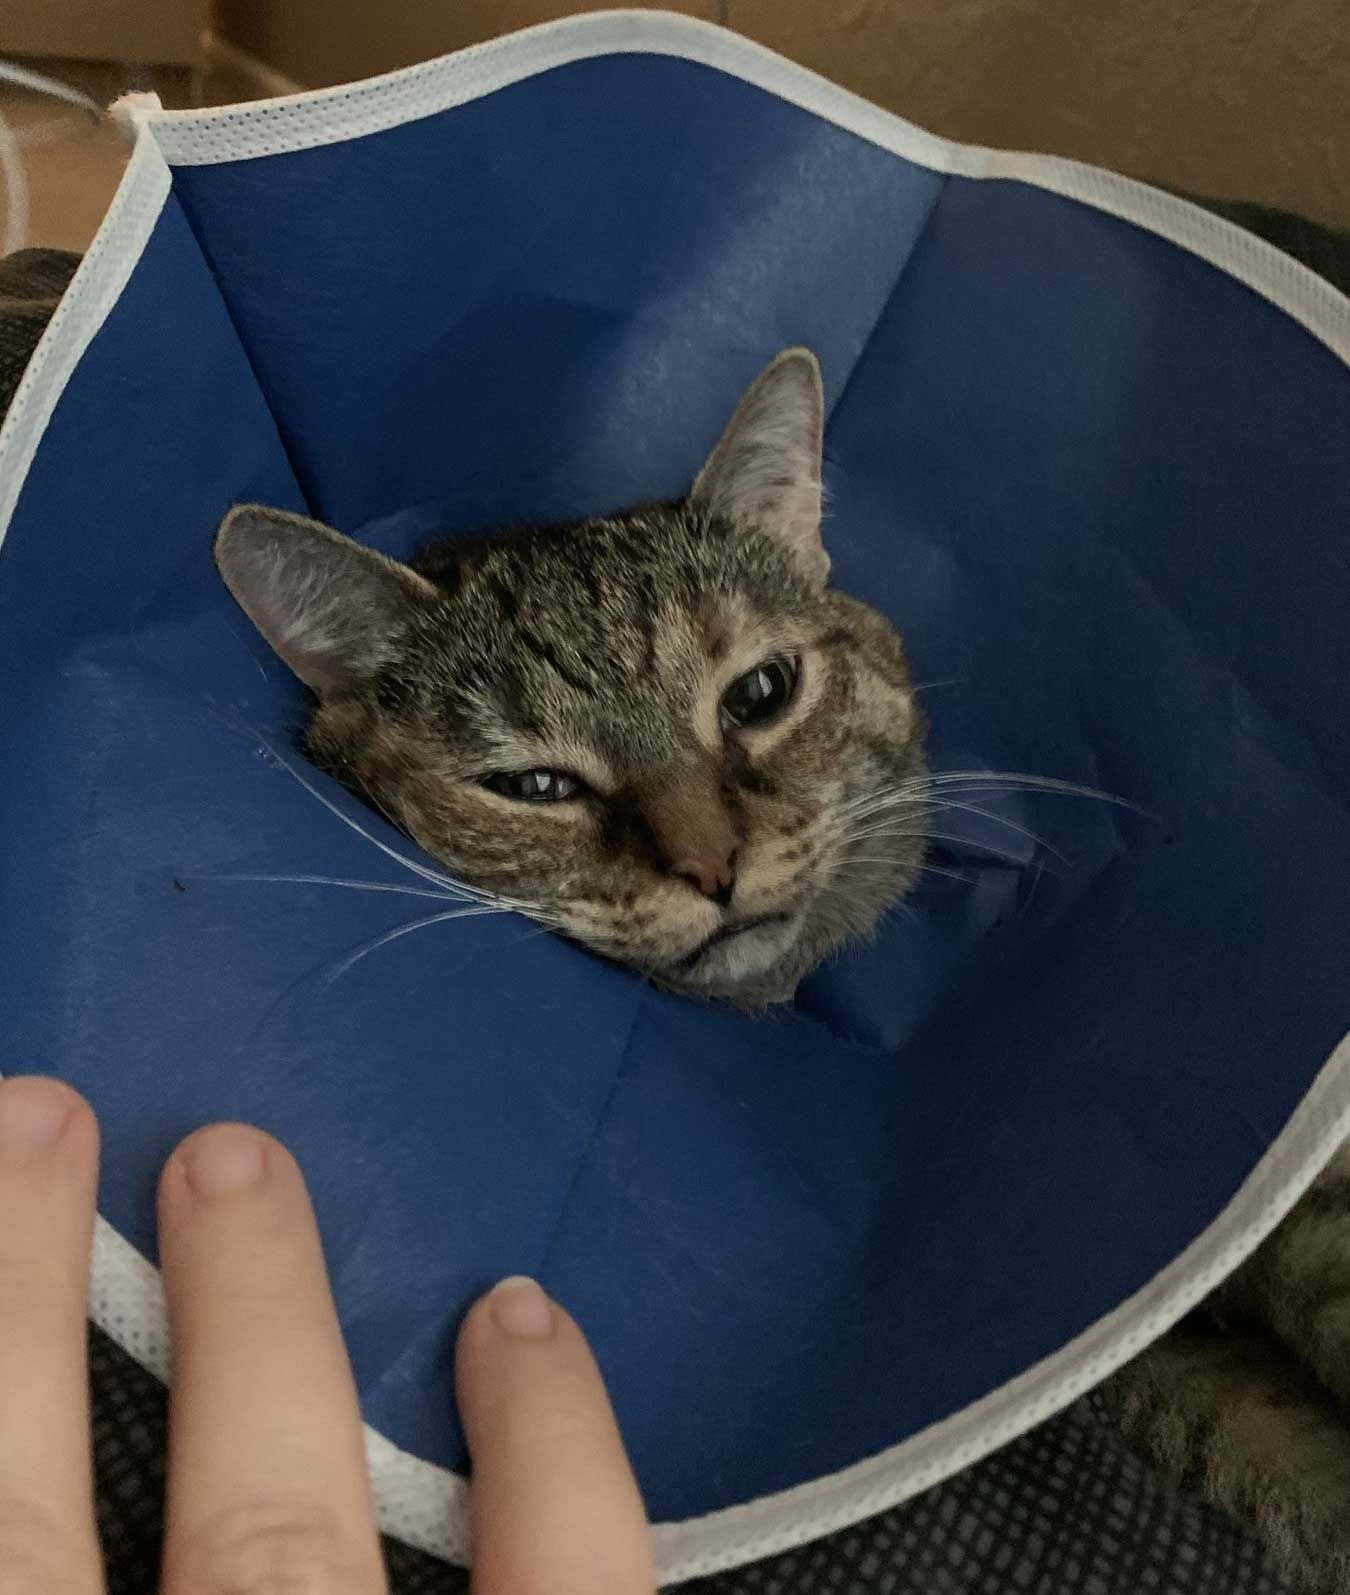 Cora hates her new cone